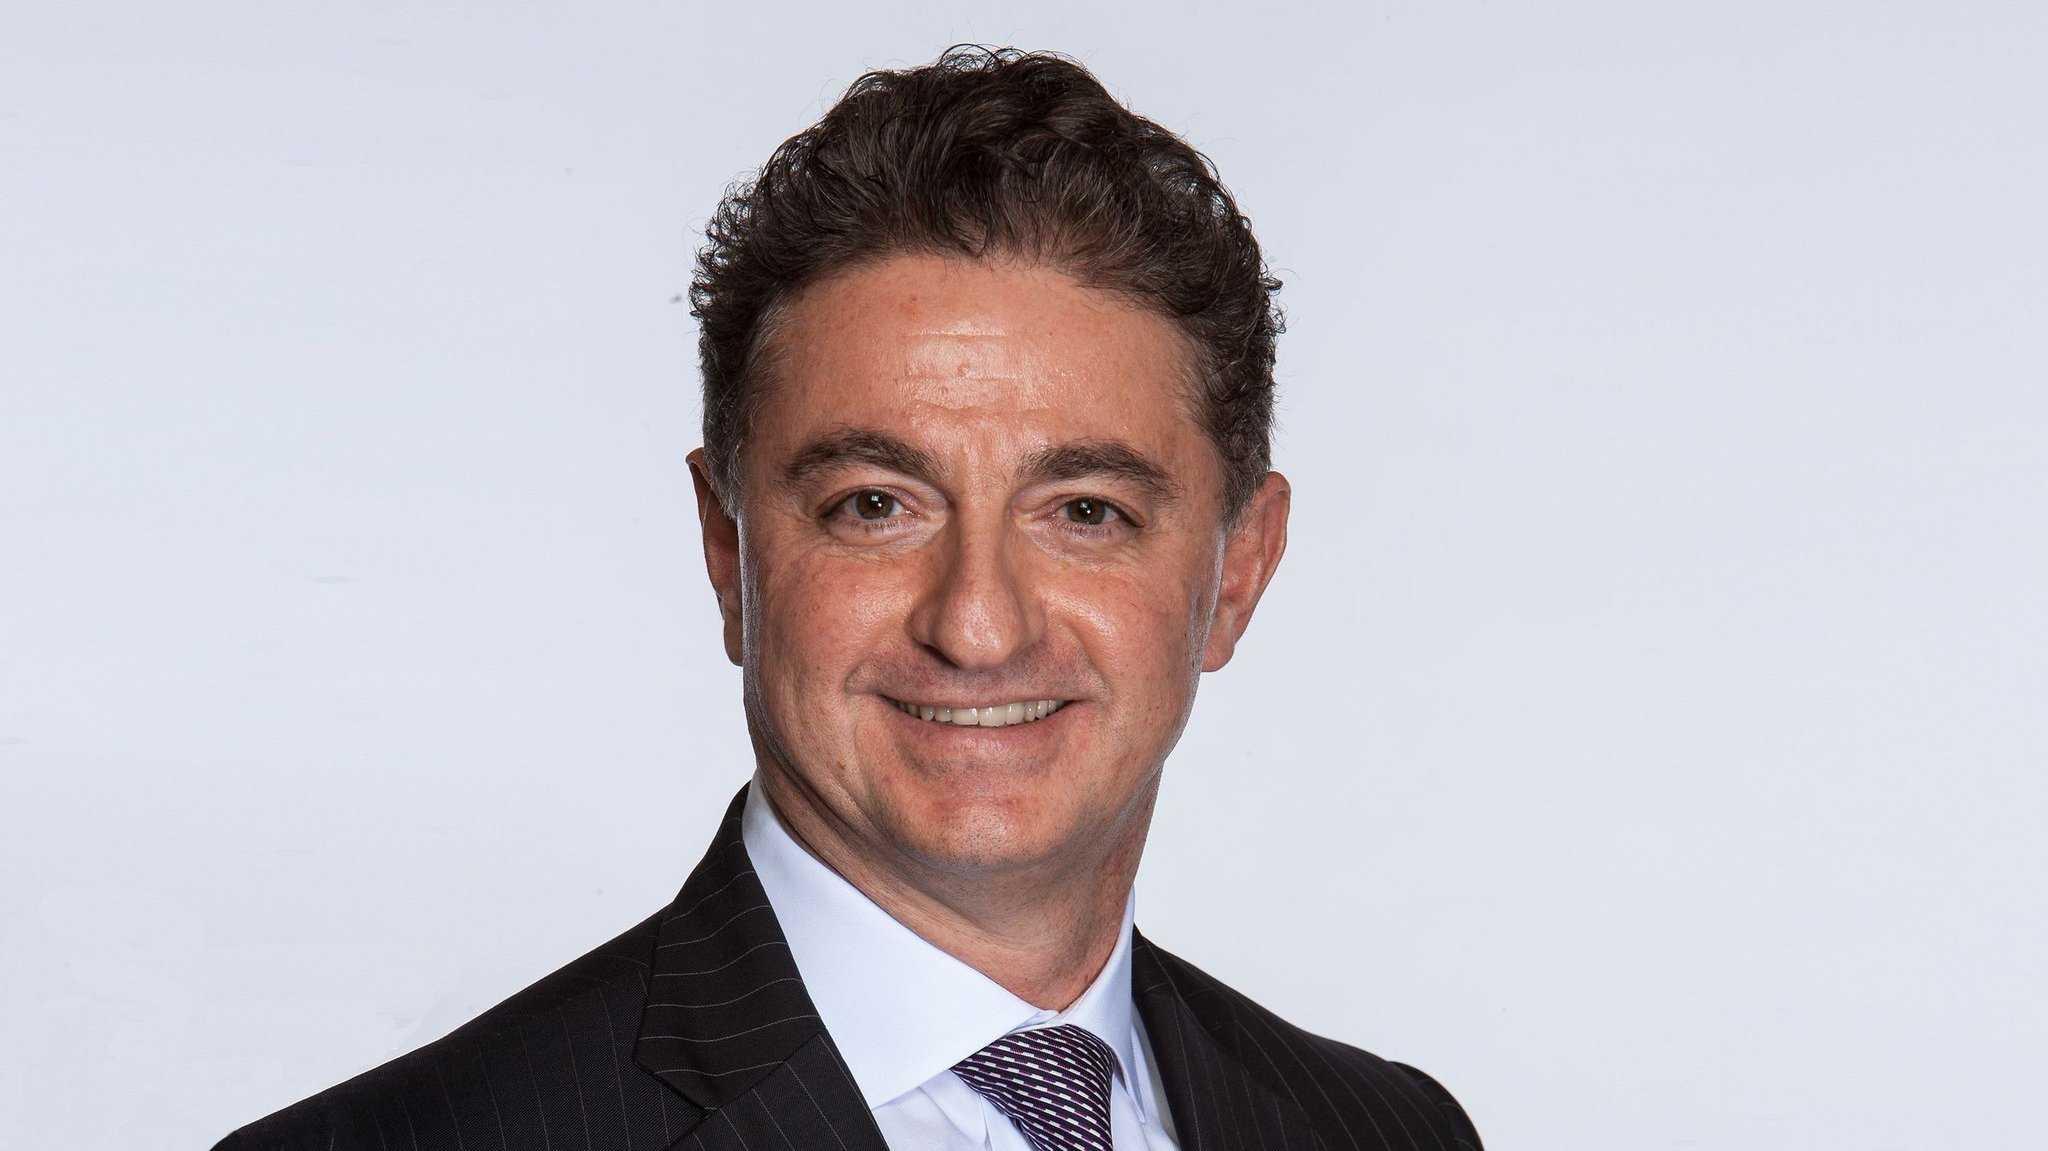 US-Amerikaner Adel Al-Saleh wird neuer T-Systems-Chef